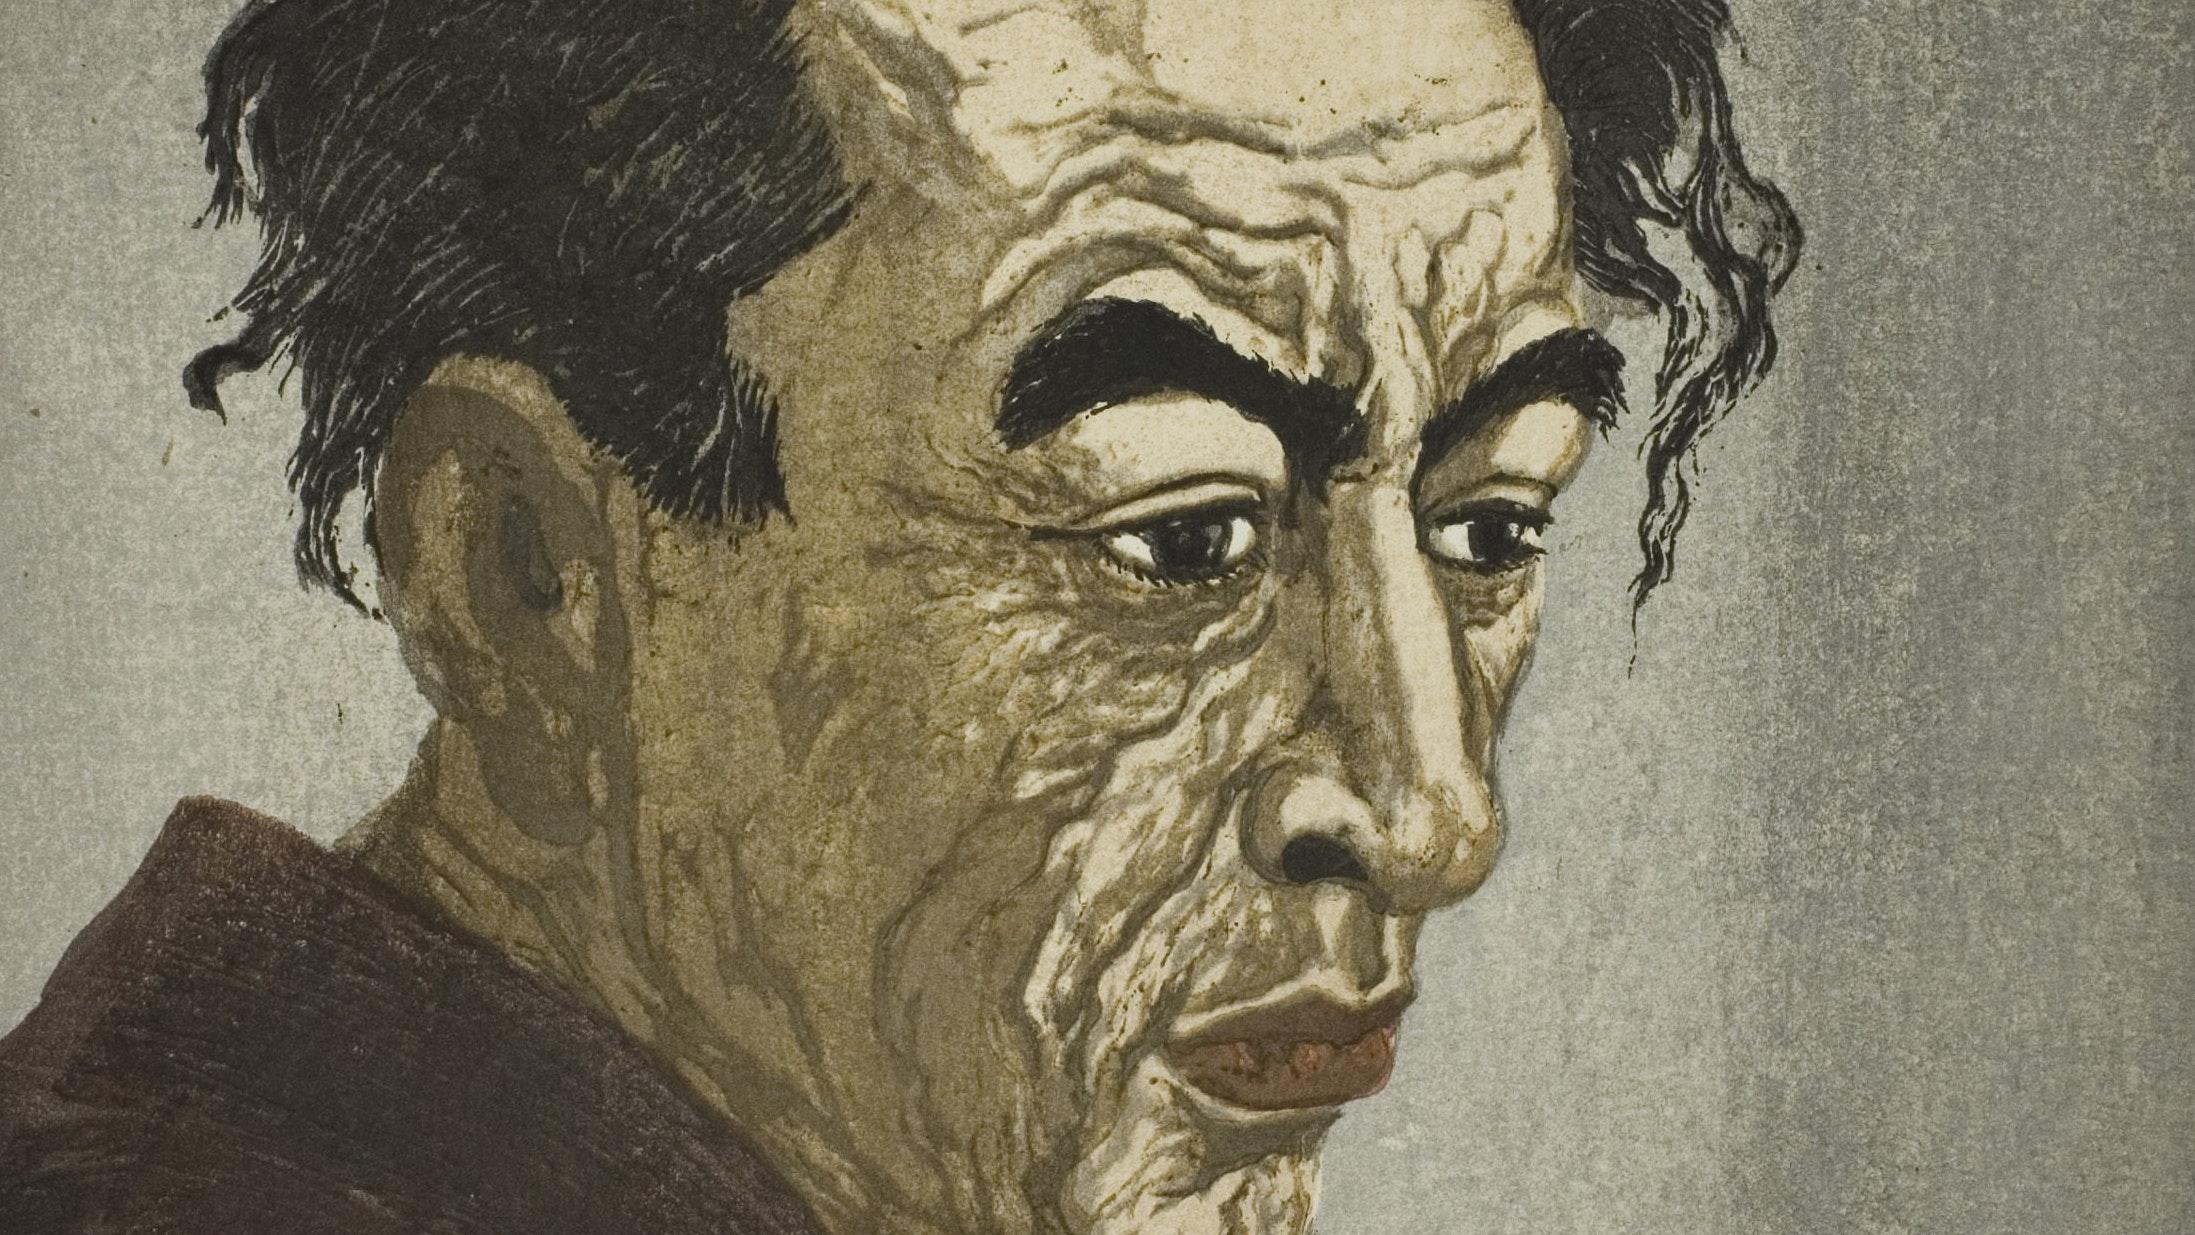 1962.251 Onchi Koshiro Portrait Of The Poet Hagiwara Sakutaro